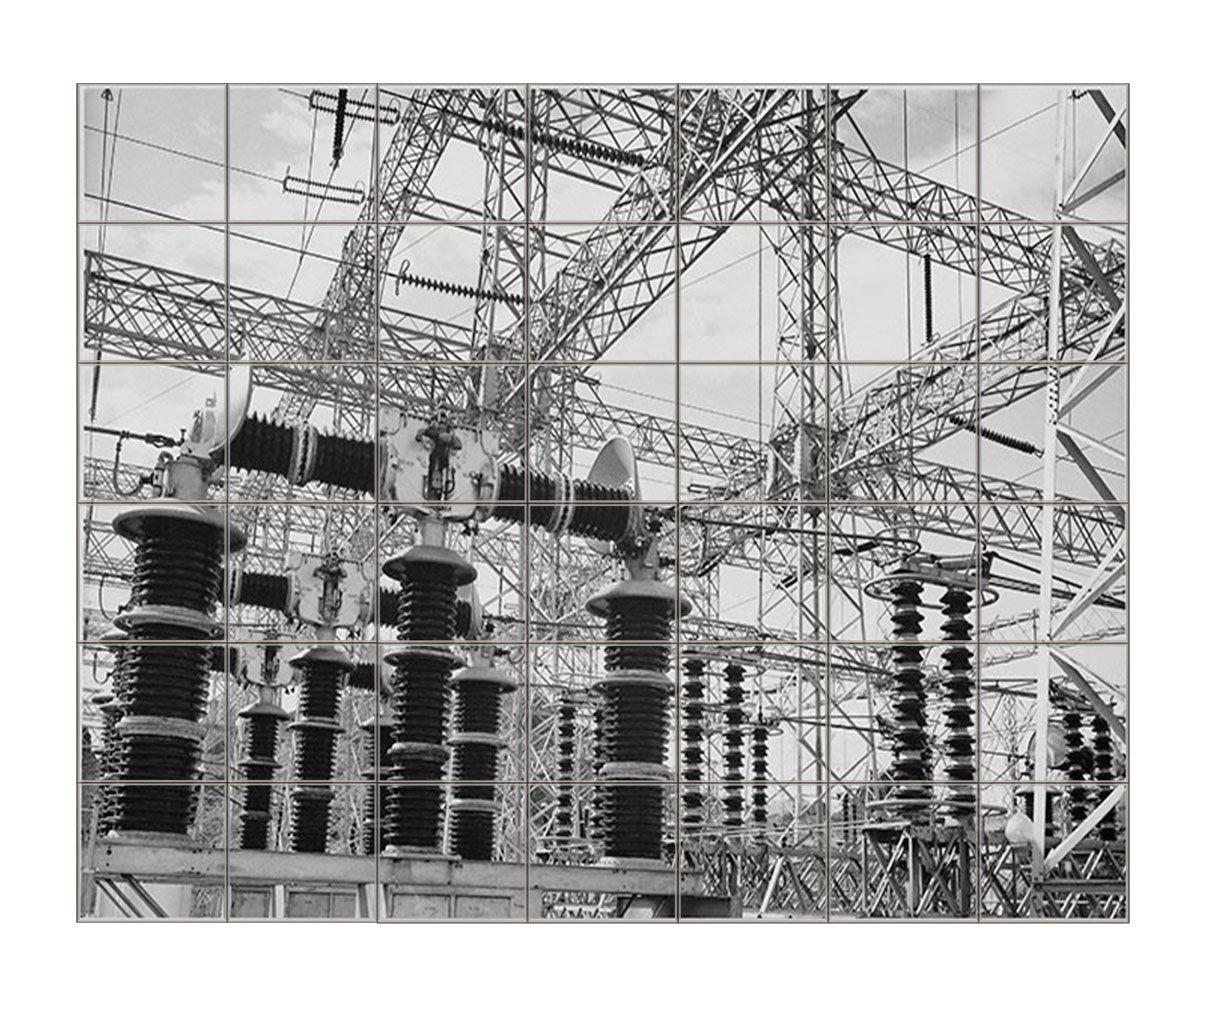 Wires Boulder Dam Power Units (Adams) Horizontal Tile Mural Satin Finish 36''Hx42''W 6 Inch Tile